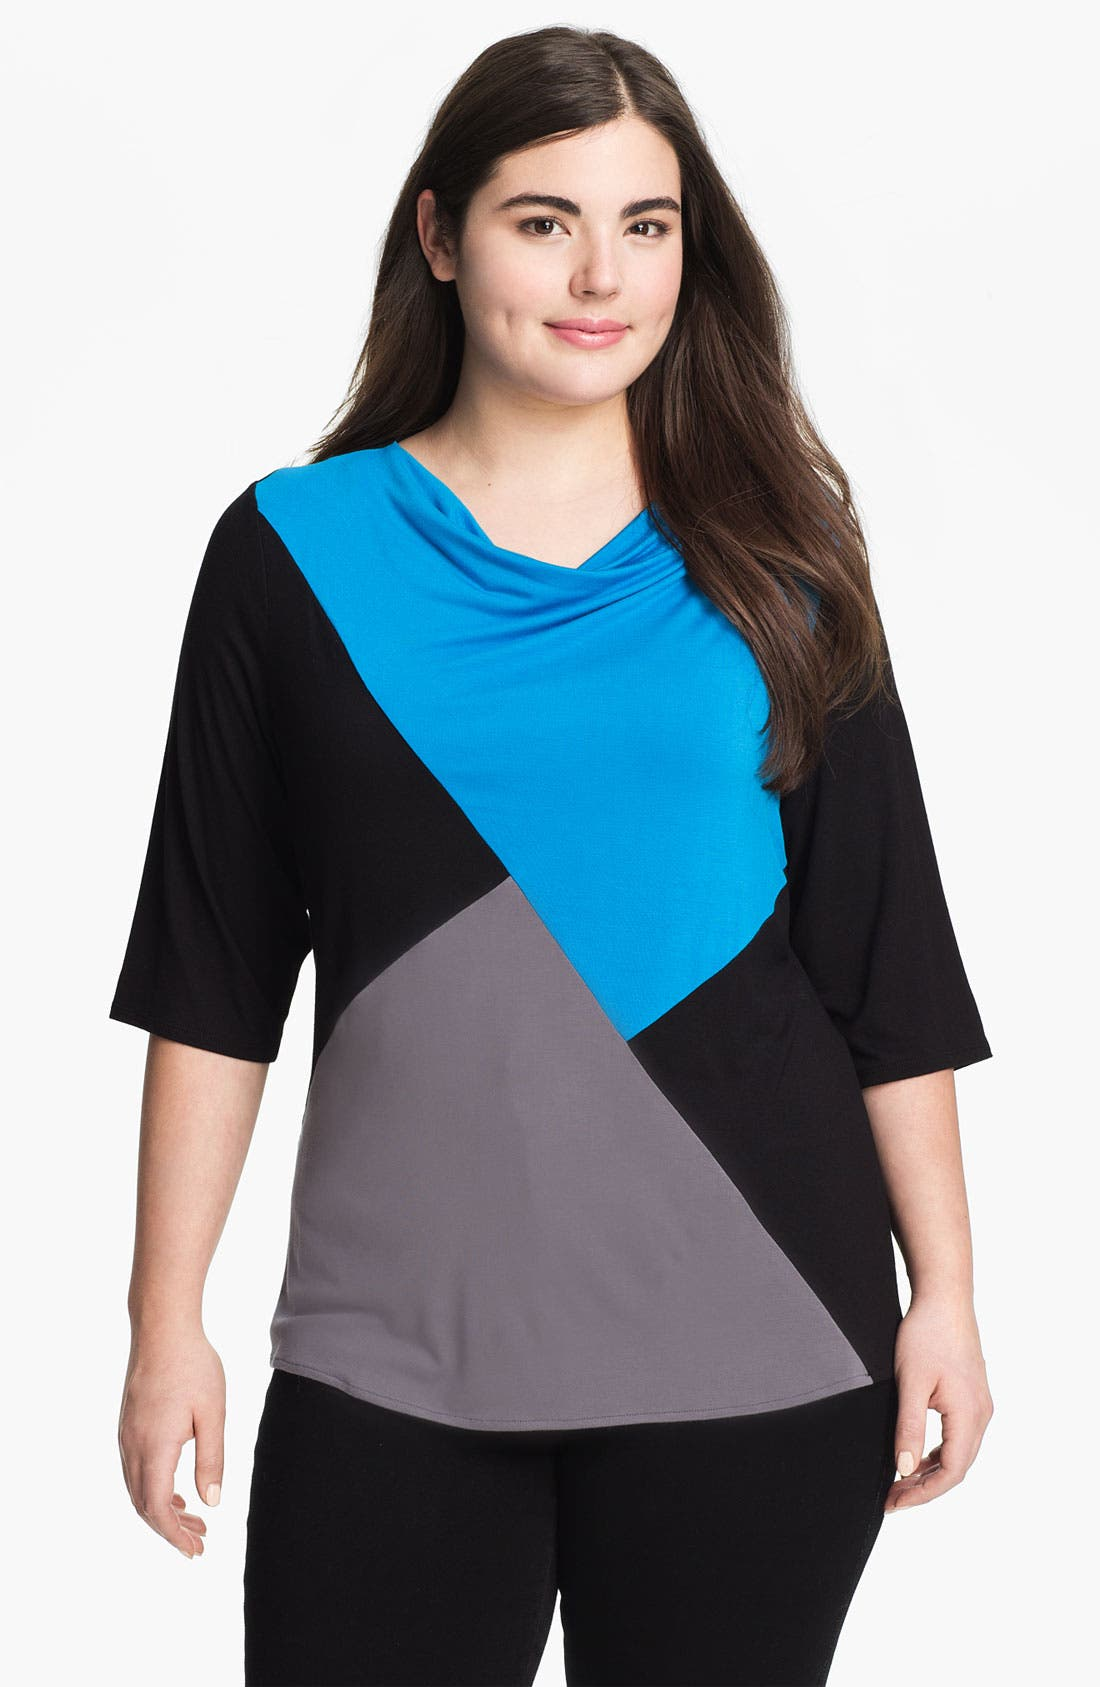 Alternate Image 1 Selected - Sejour Colorblock Drape Neck Top (Plus)